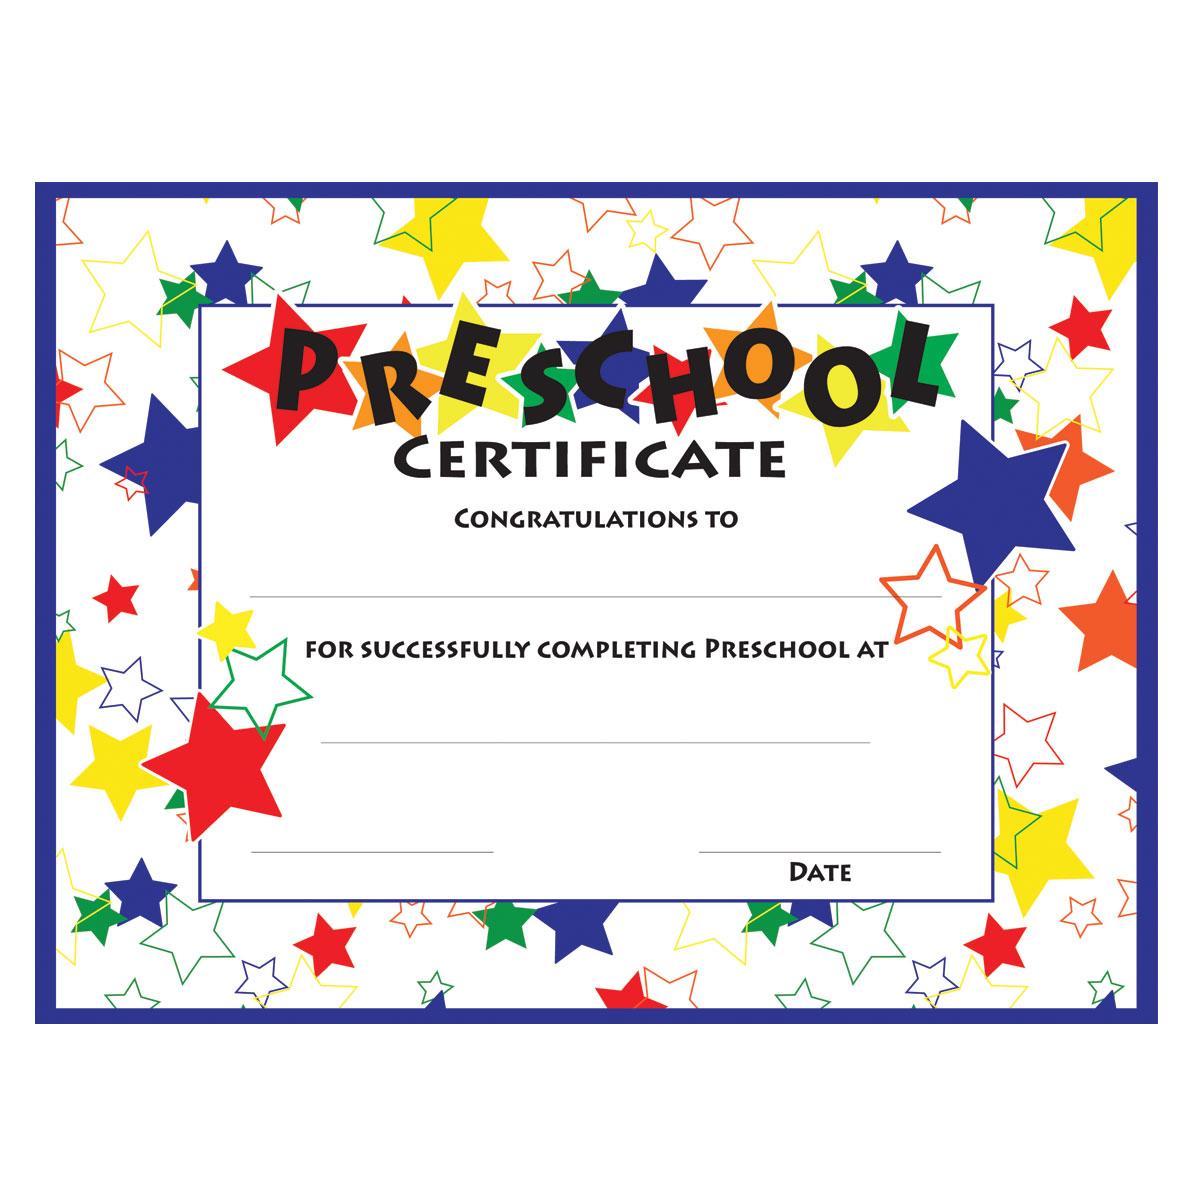 Preschool Graduation Certificate Template Free 3